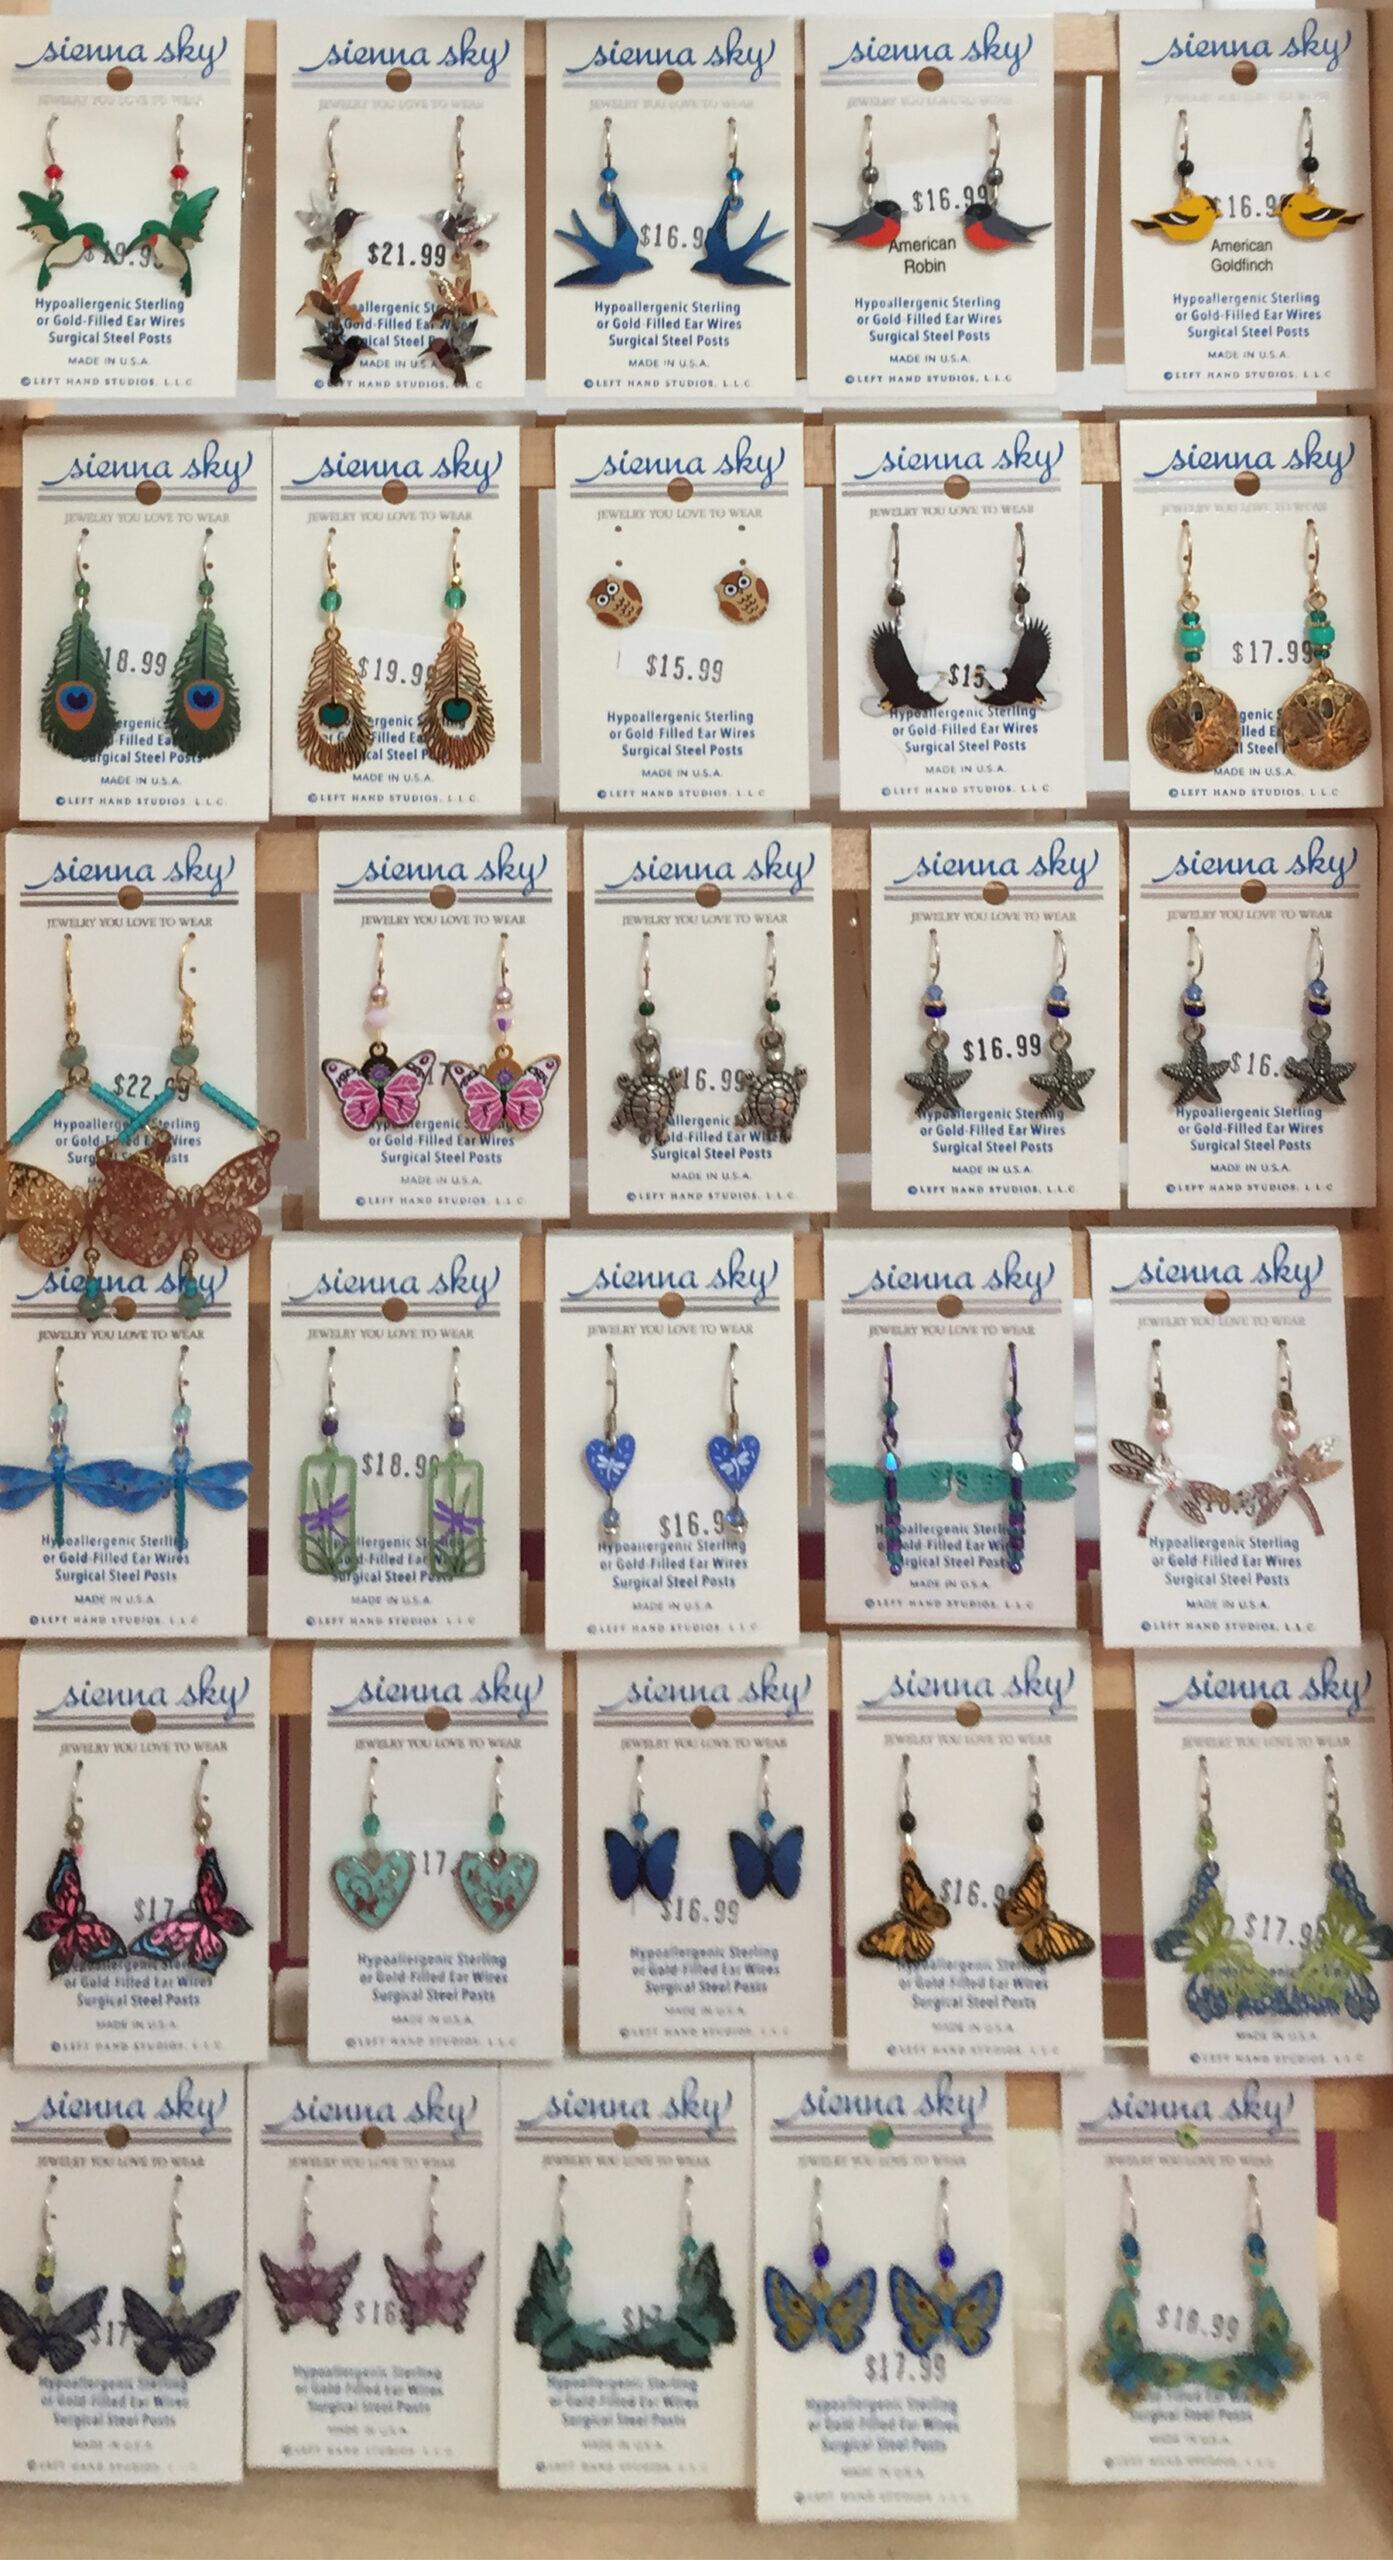 The Backyard Naturalist has Sienna Sky earrings for 2020 in stock.